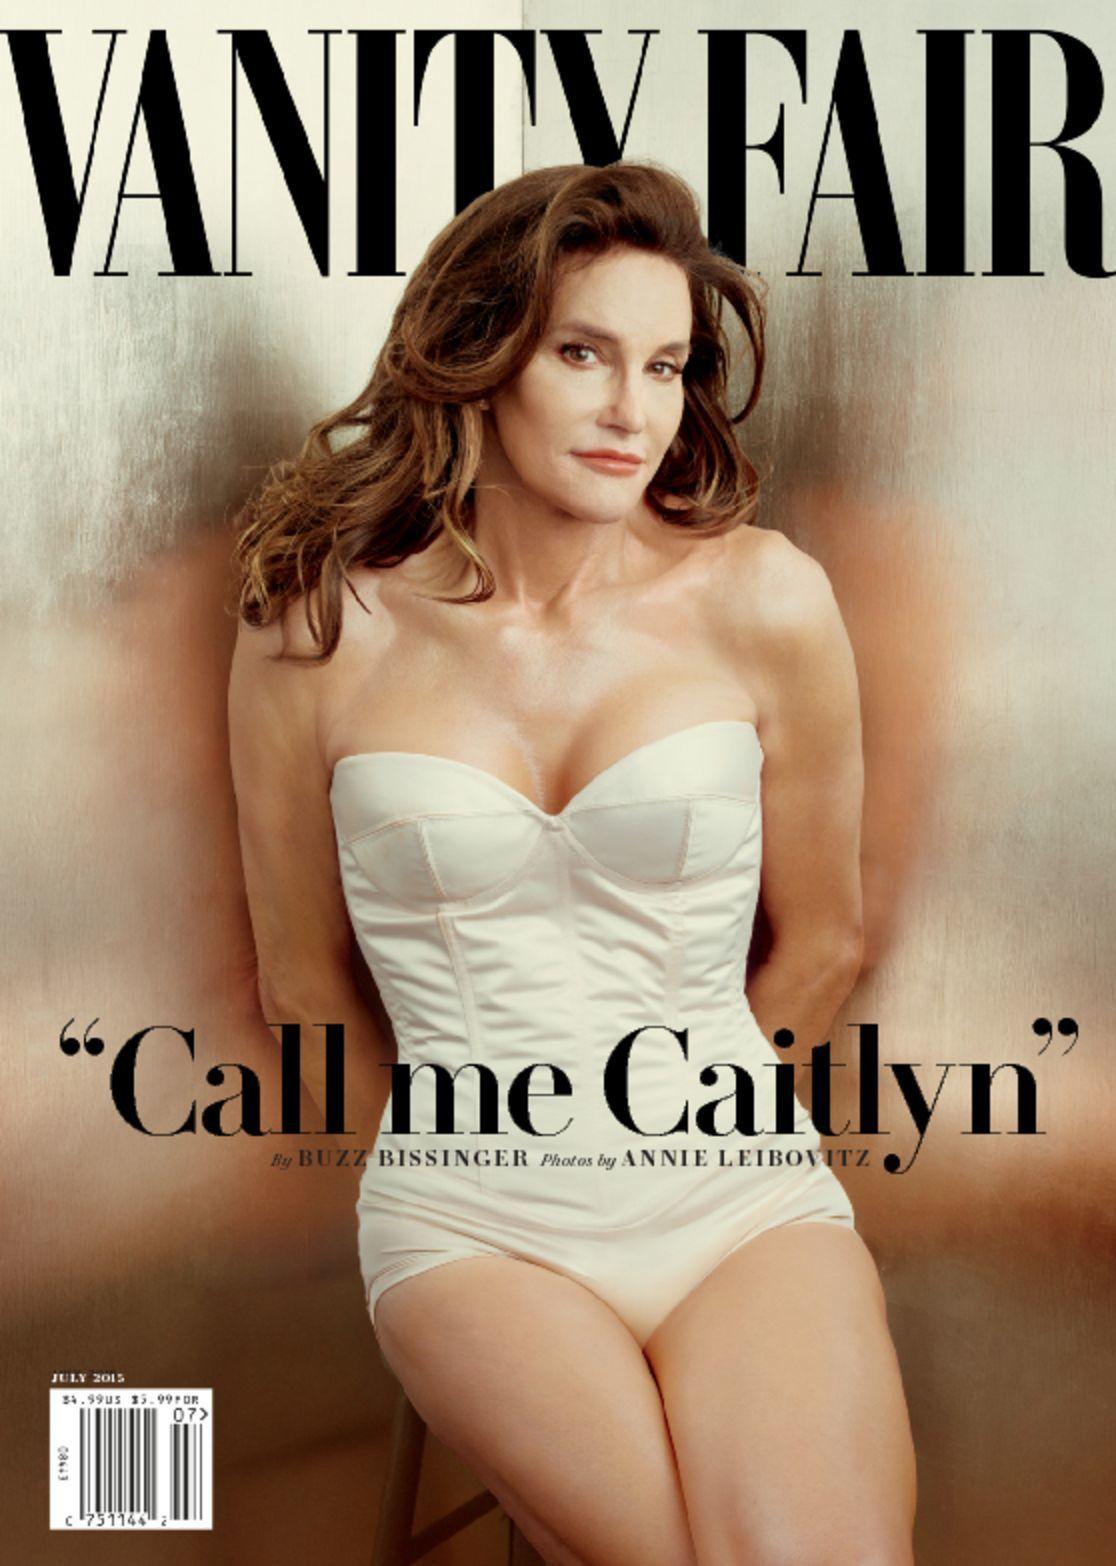 Vanity Fair Caitlyn Jenner Digital